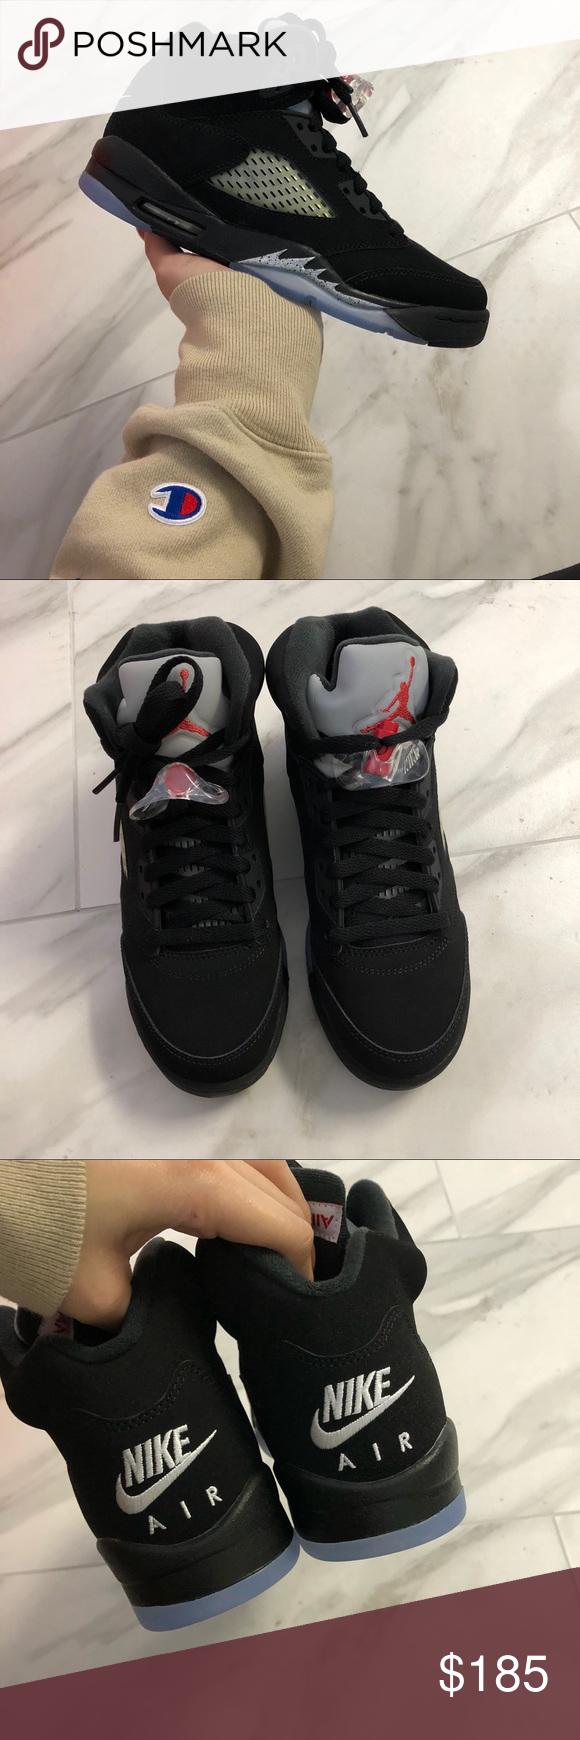 Air Jordan 5 Retro OG BG | Air jordan 5